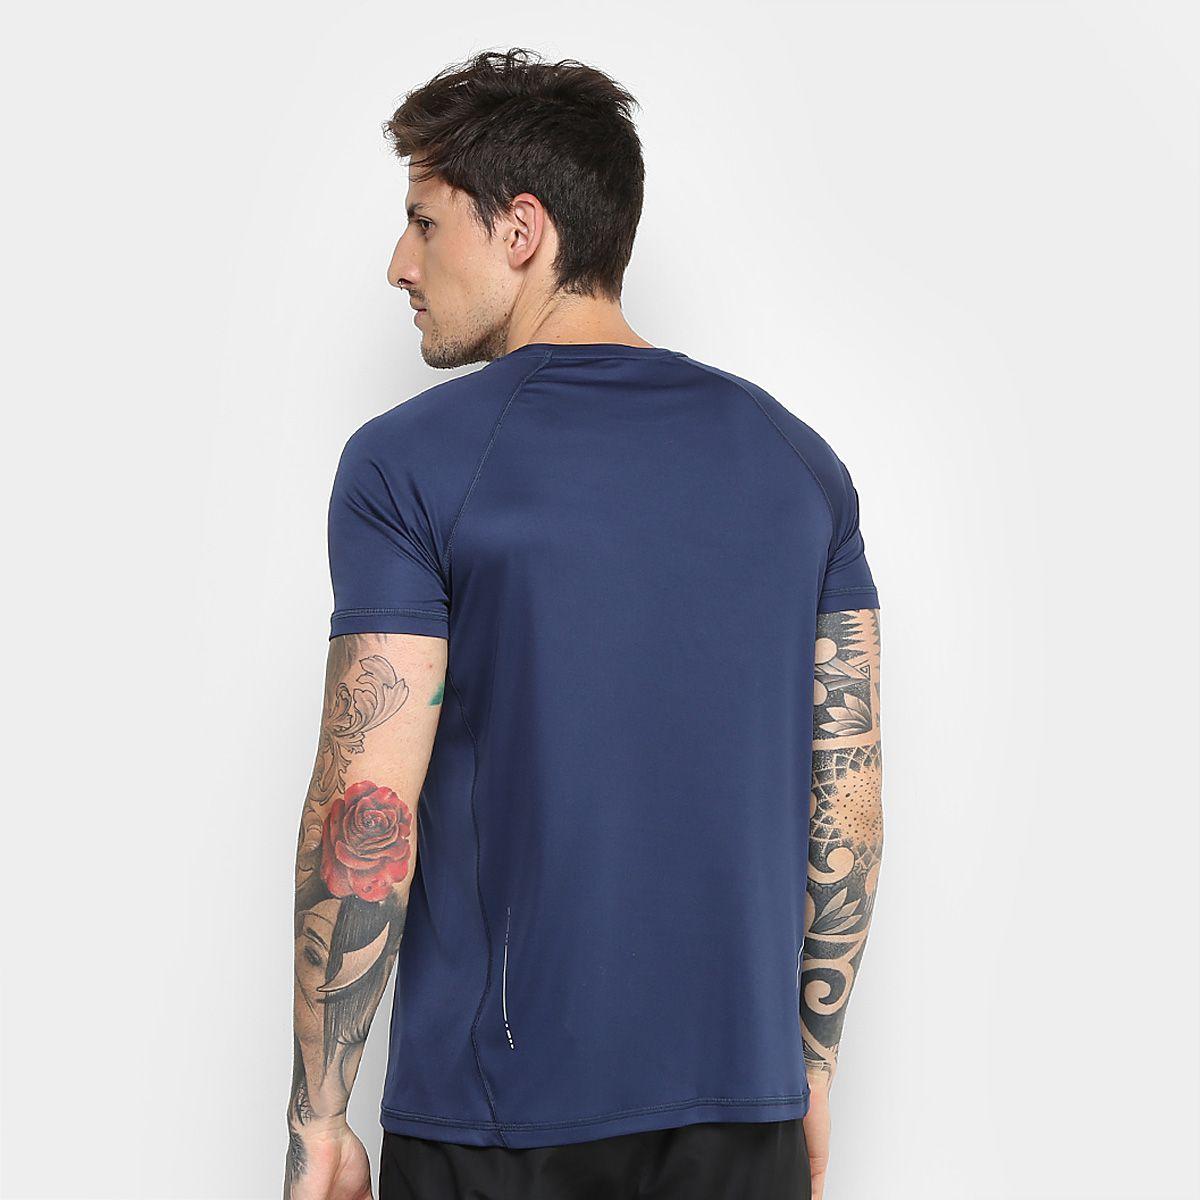 Camiseta Asics Core Pes Ss I Masculina - Marinho - Original